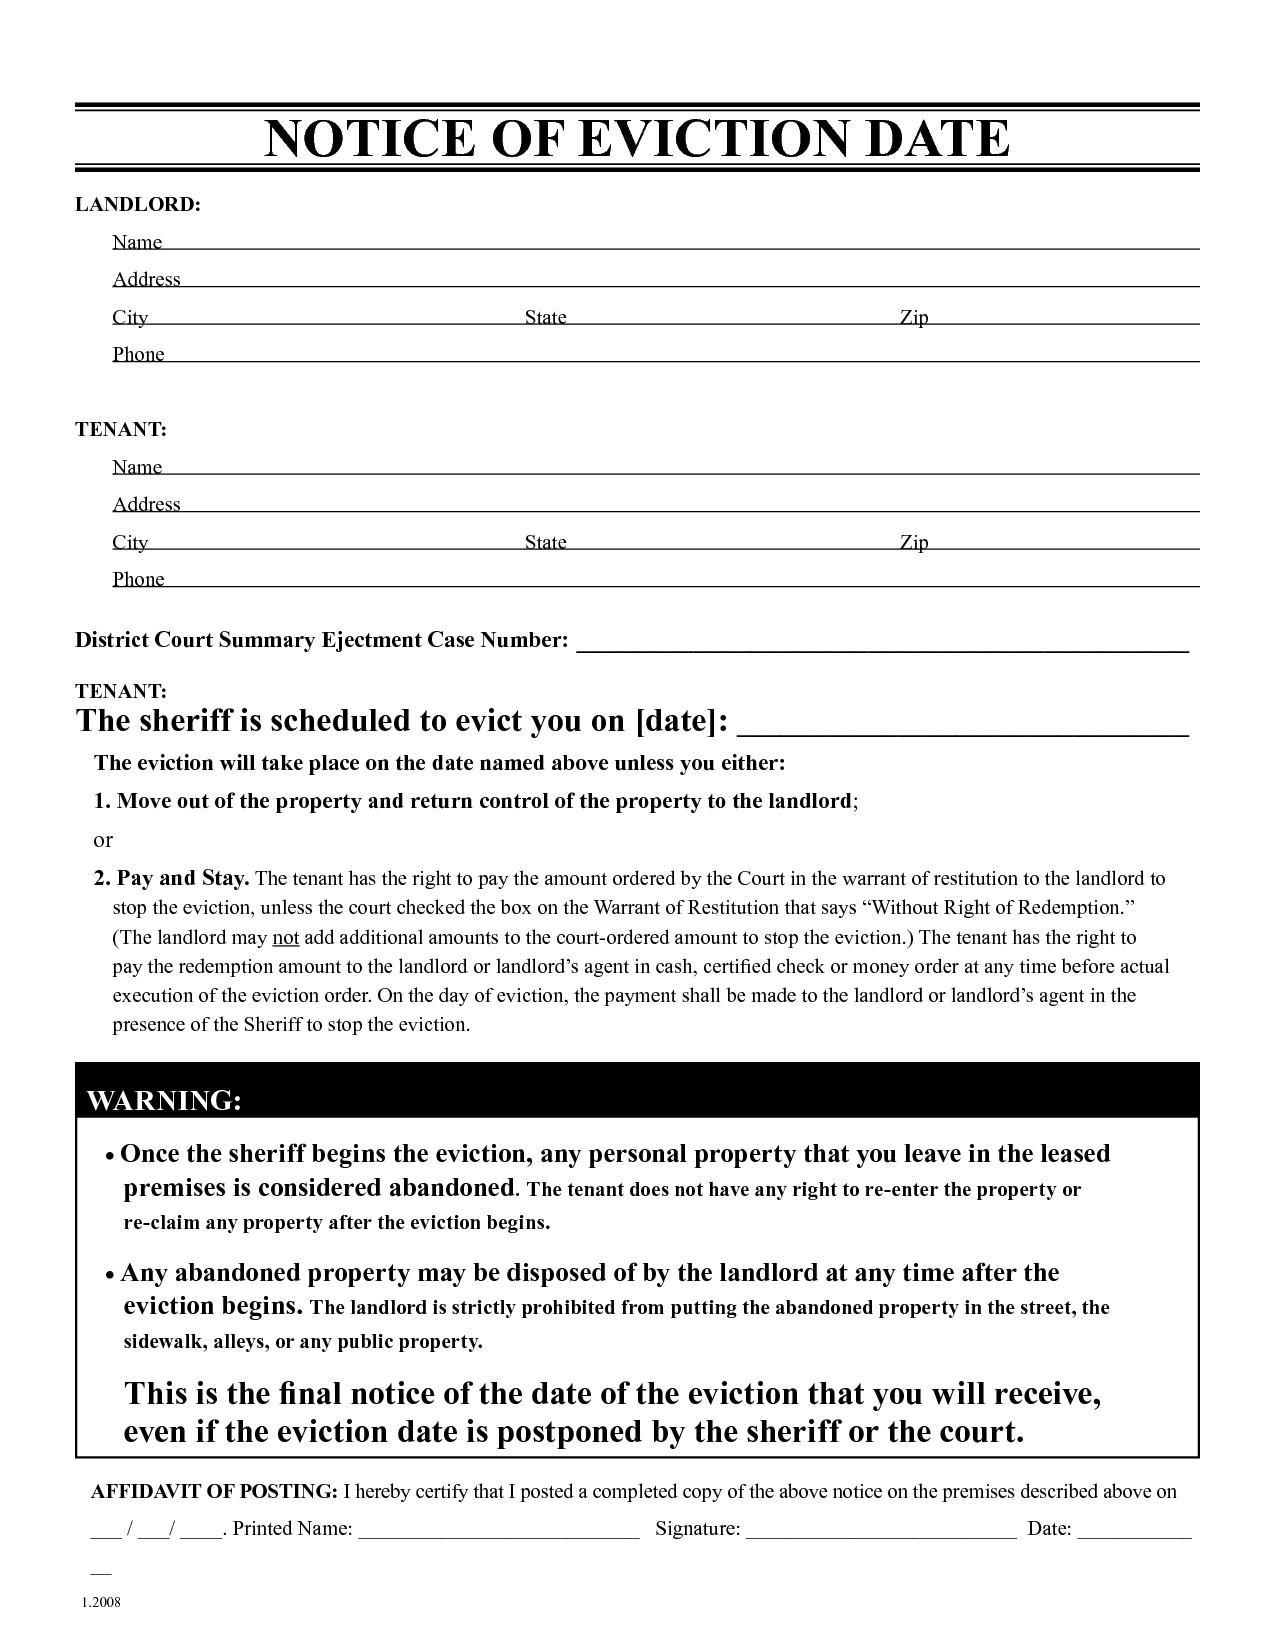 30 Day Eviction Notice Form Missouri